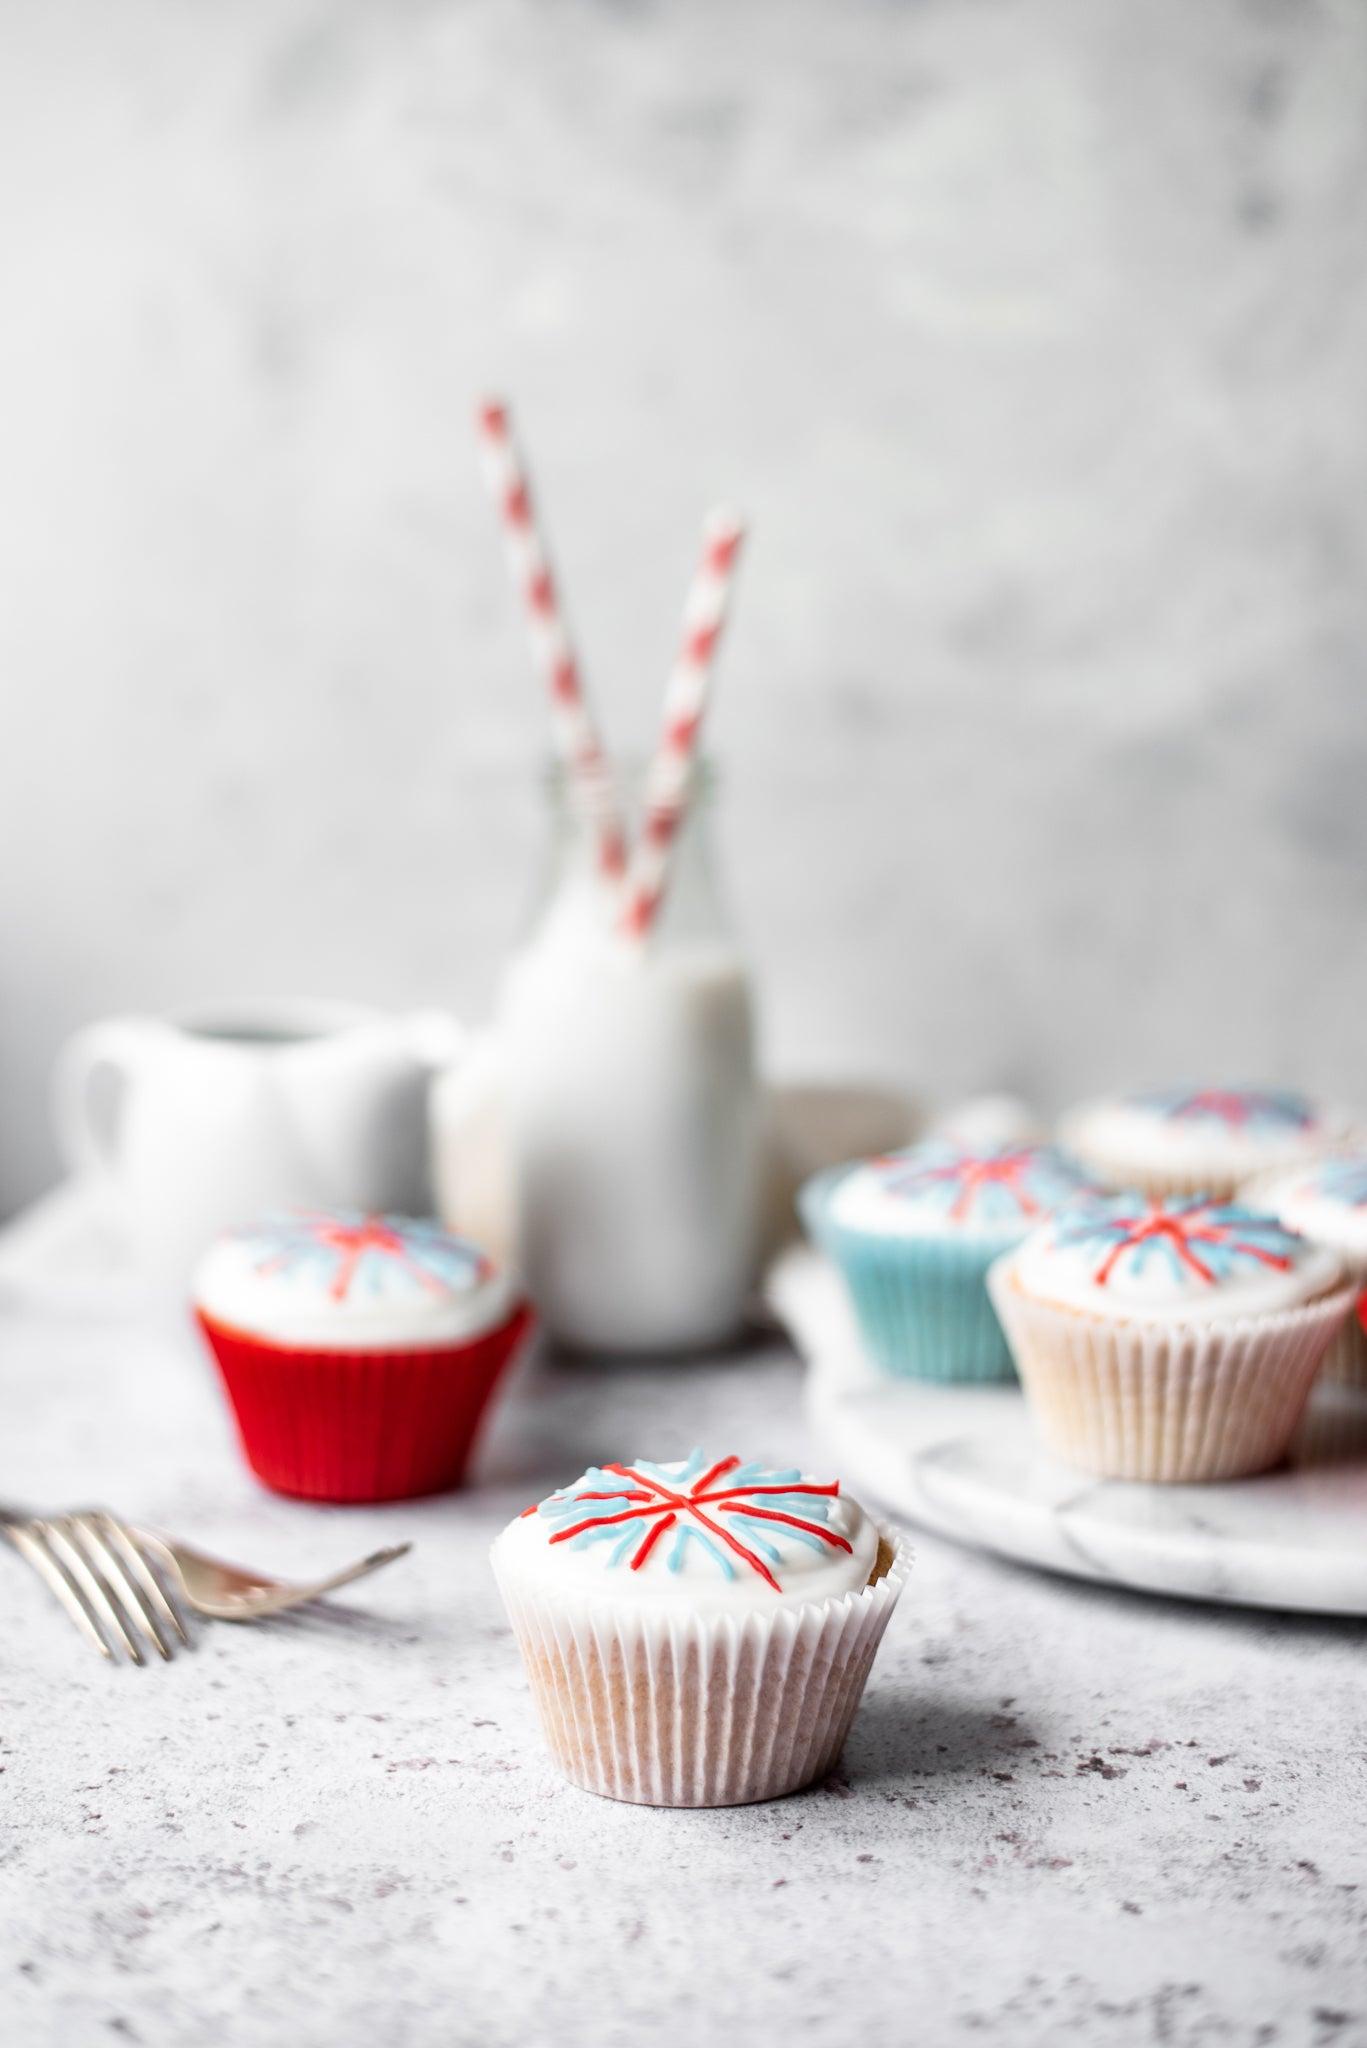 Union-Jack-Cupcakes-WEB-RES-5.jpg